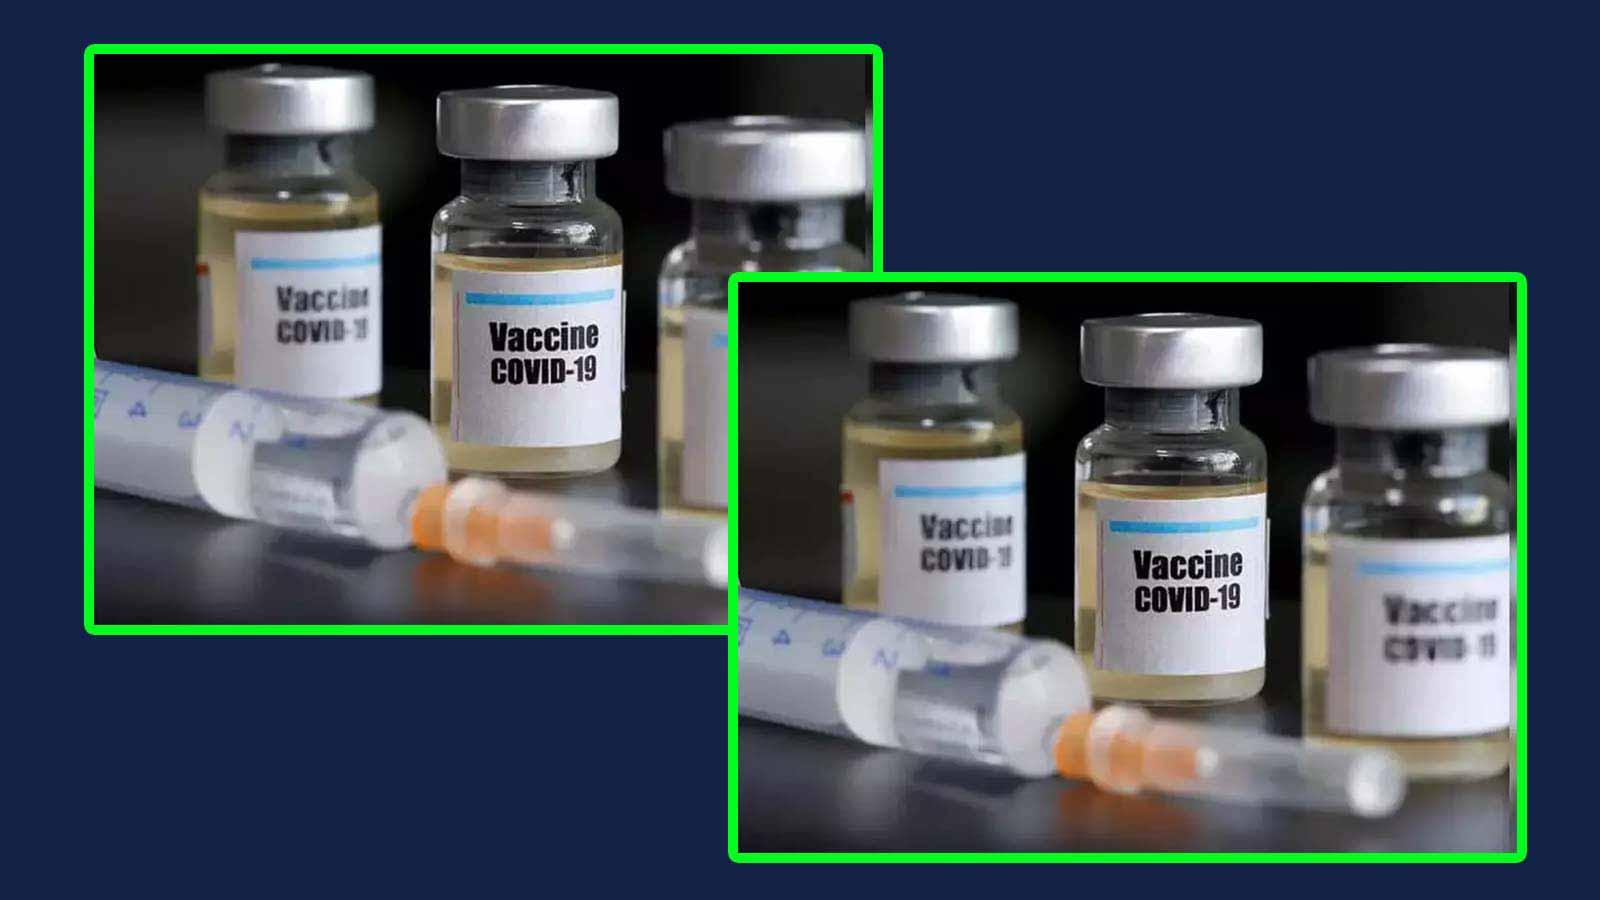 no-vaccine-for-respiratory-diseases-has-100-efficacy-icmr